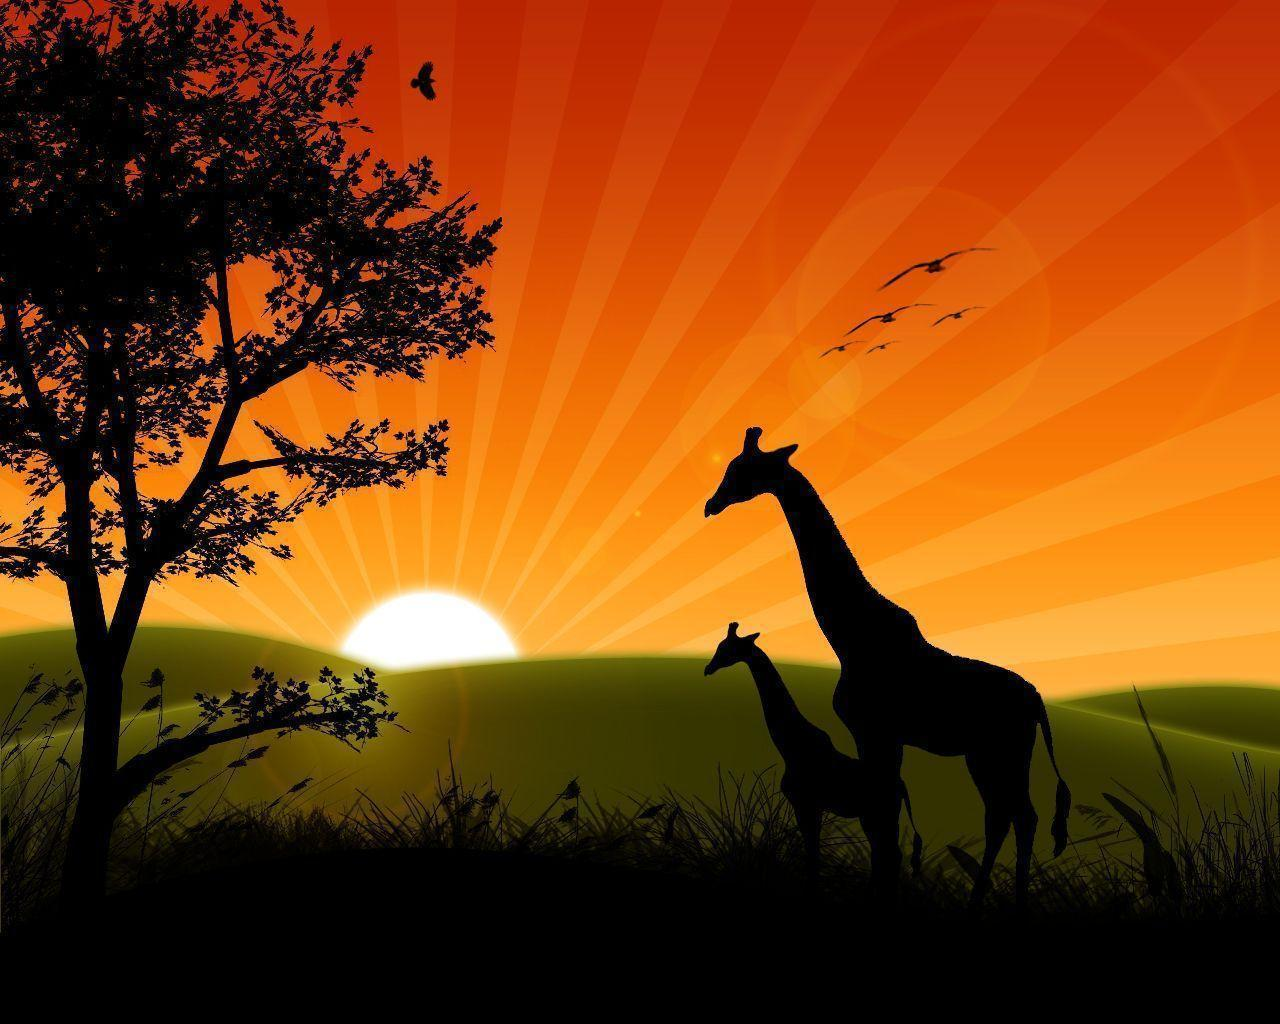 Sunrise Wallpaper Animated Hd Widescreen 11 HD Wallpapers   Eakai.